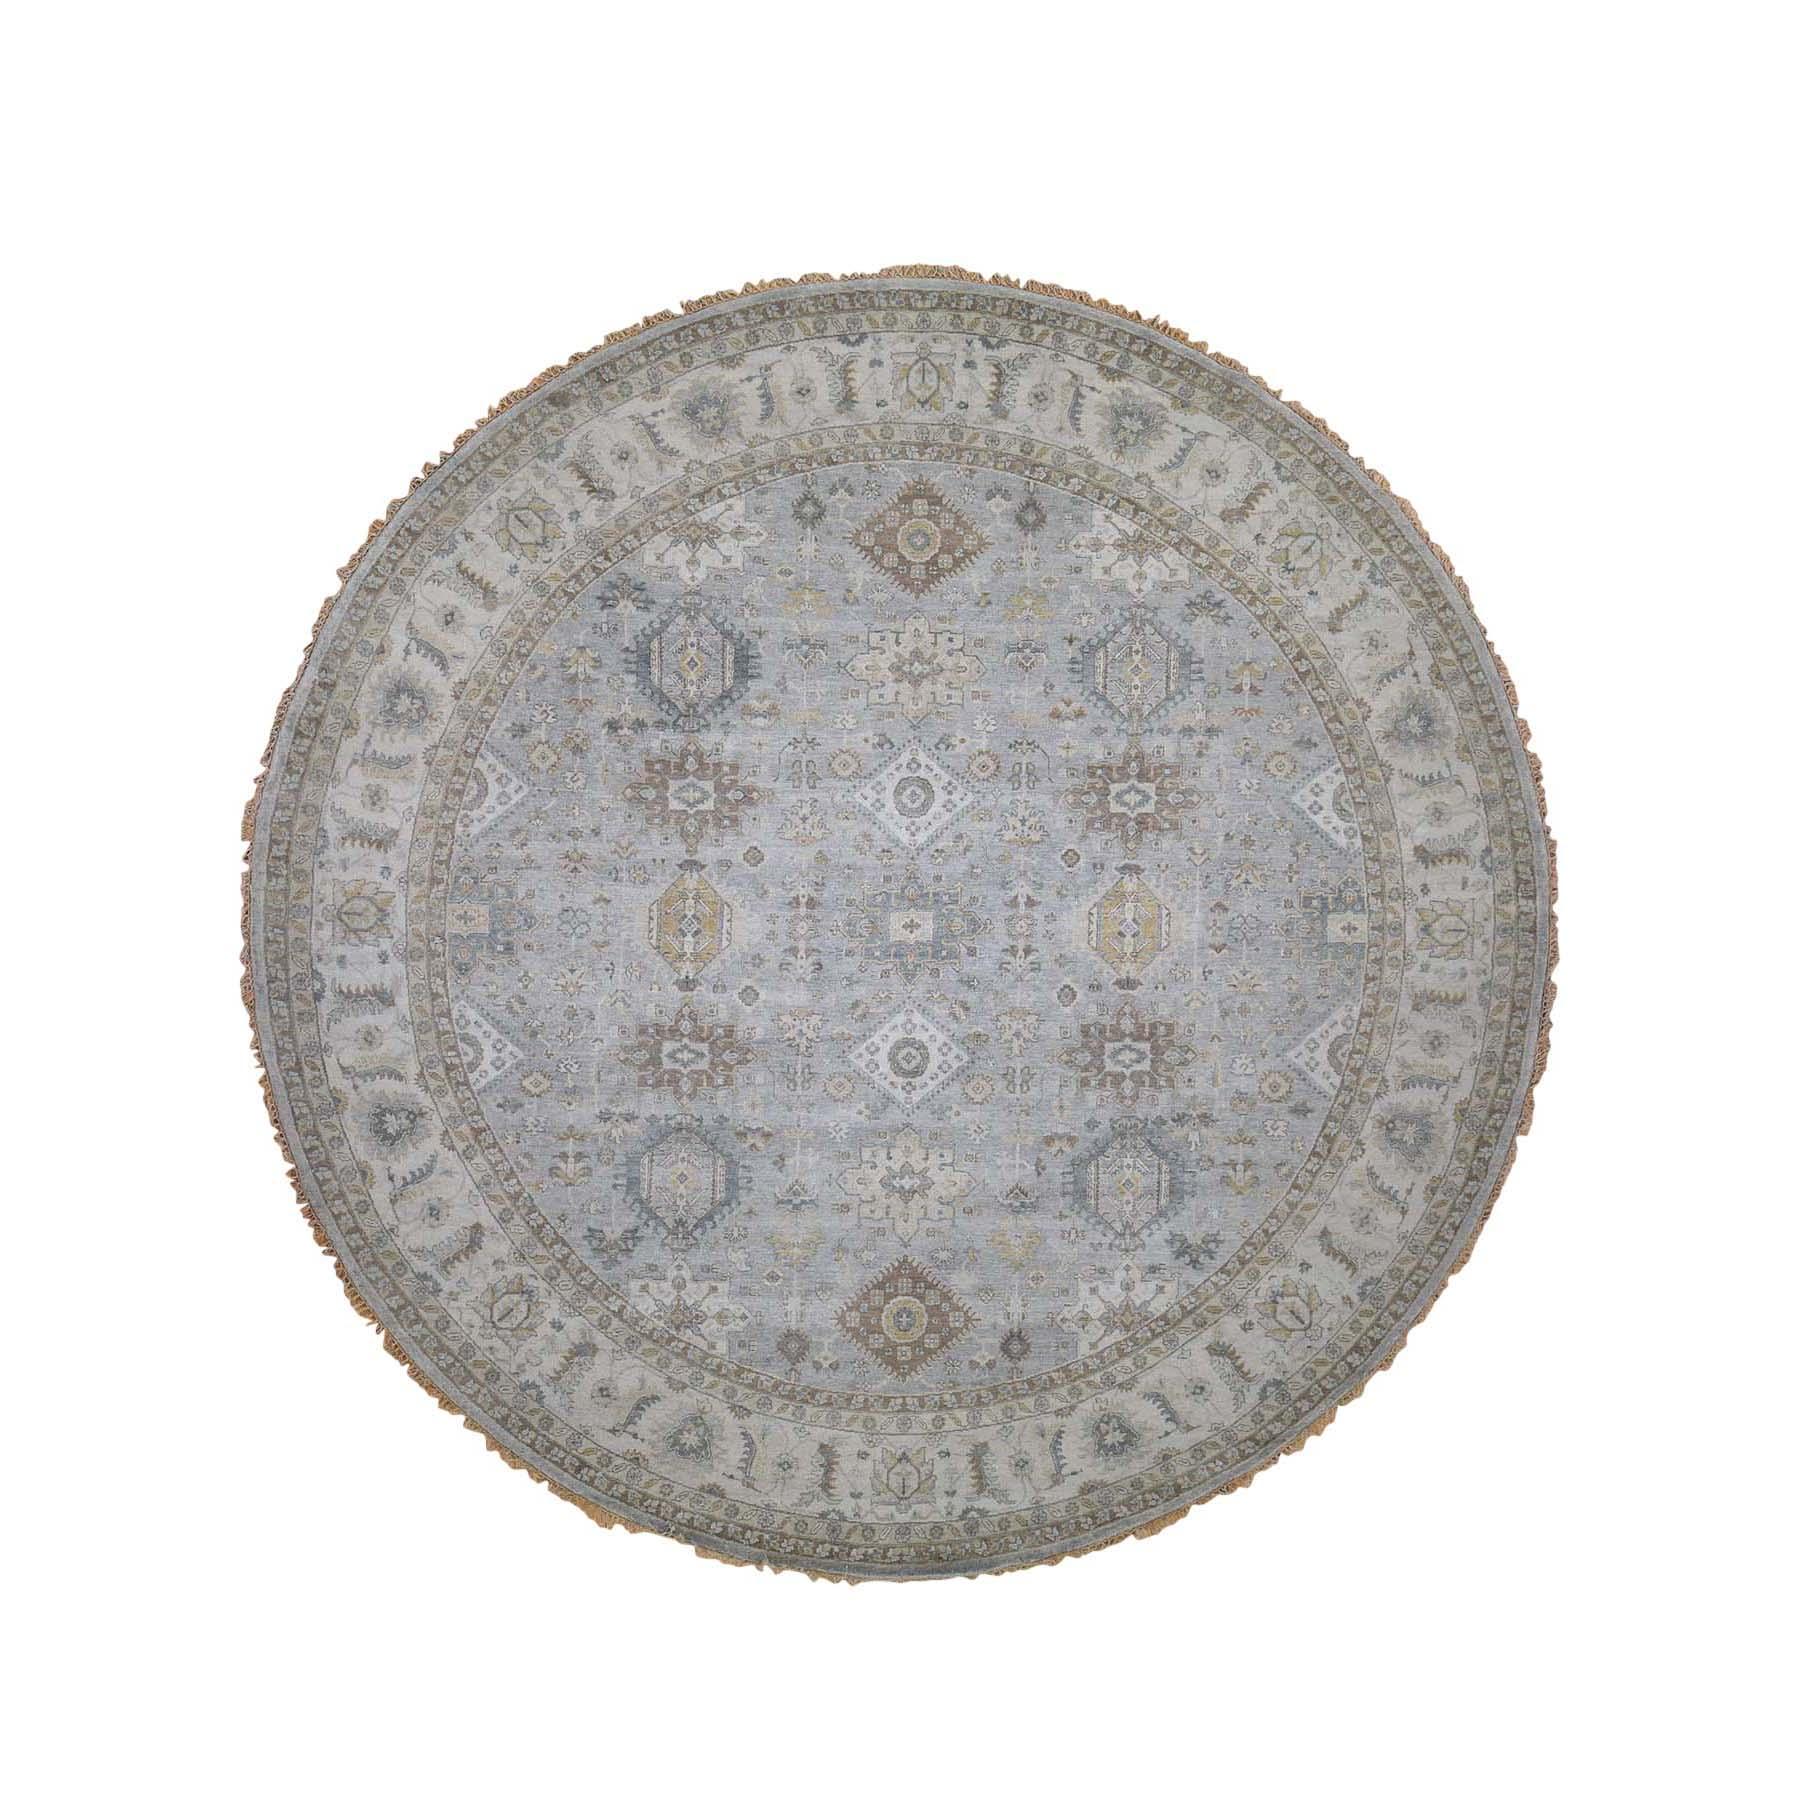 8'X8' Hand-Knotted Karajeh 100 Percent Wool Oriental Round Rug moada6b8